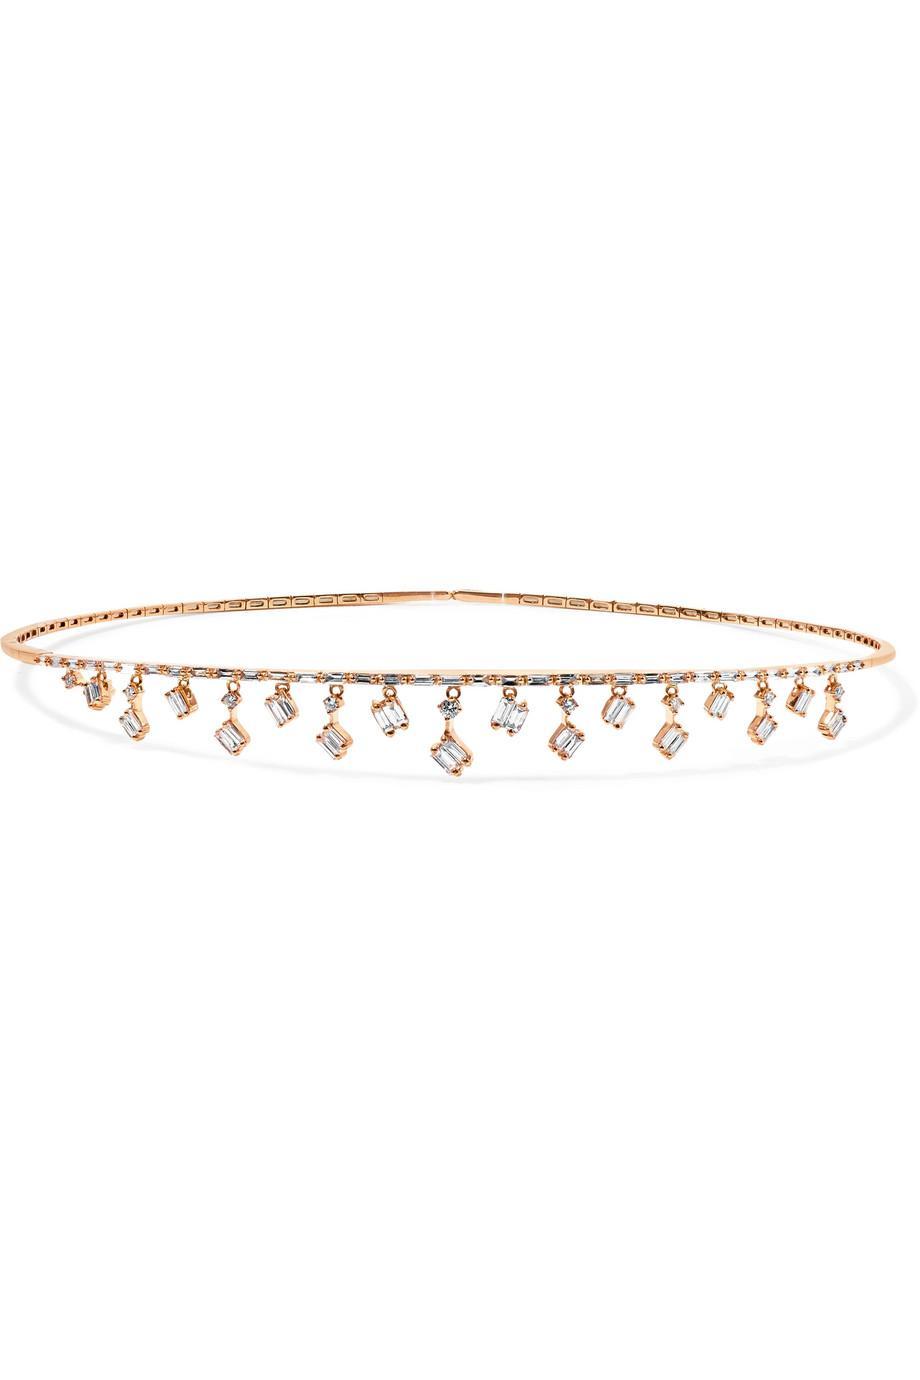 Suzanne Kalan Dangle 18-karat Rose Gold Diamond Choker PEqkixfW